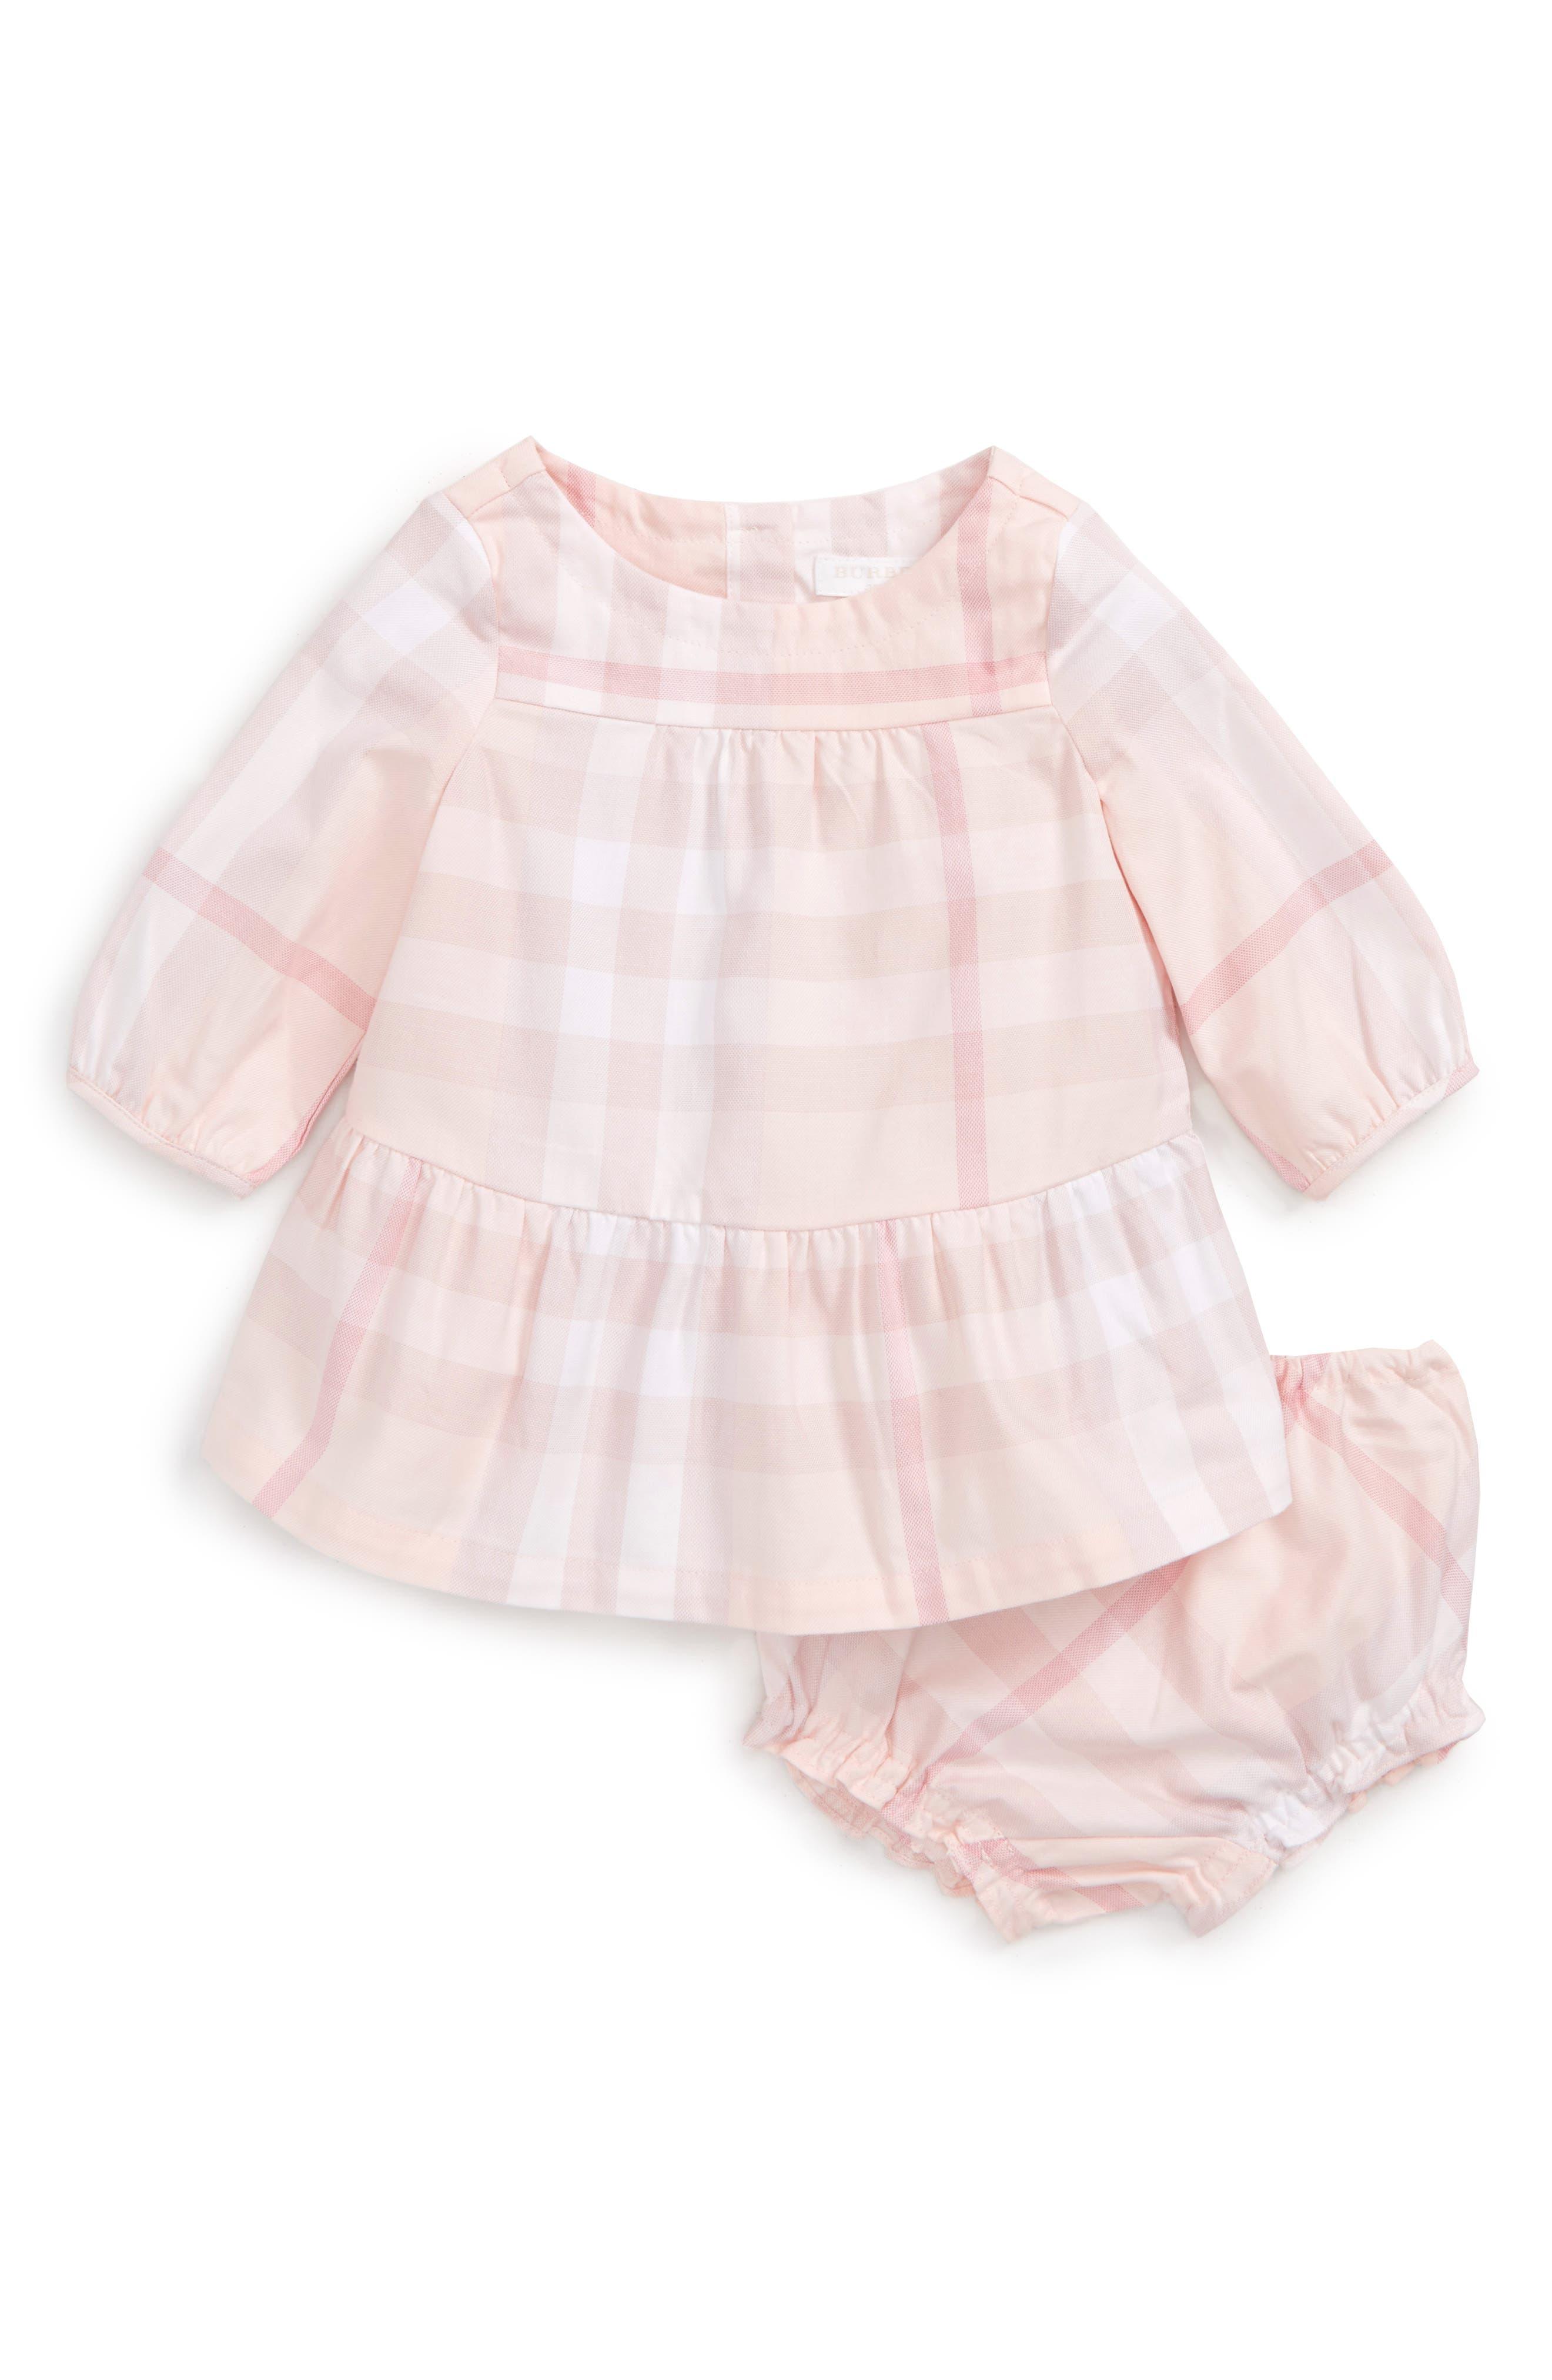 Burberry Kloey Dress (Baby Girls)